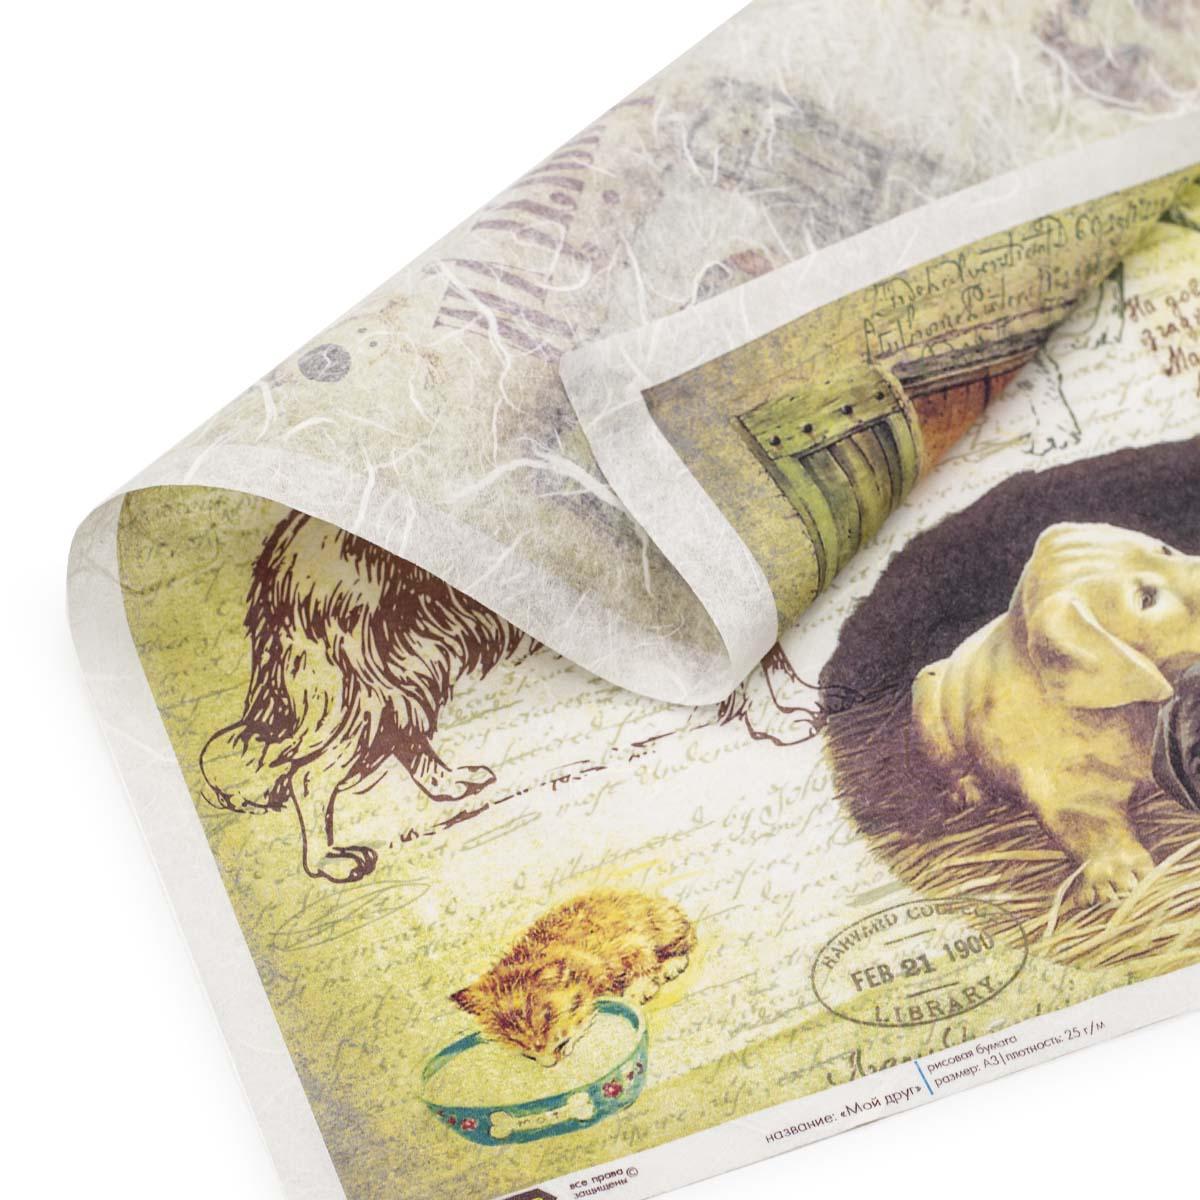 CP04419 Рисовая бумага для декупажа 'Craft Premier', 28,2х38,4см. 'Мой друг'